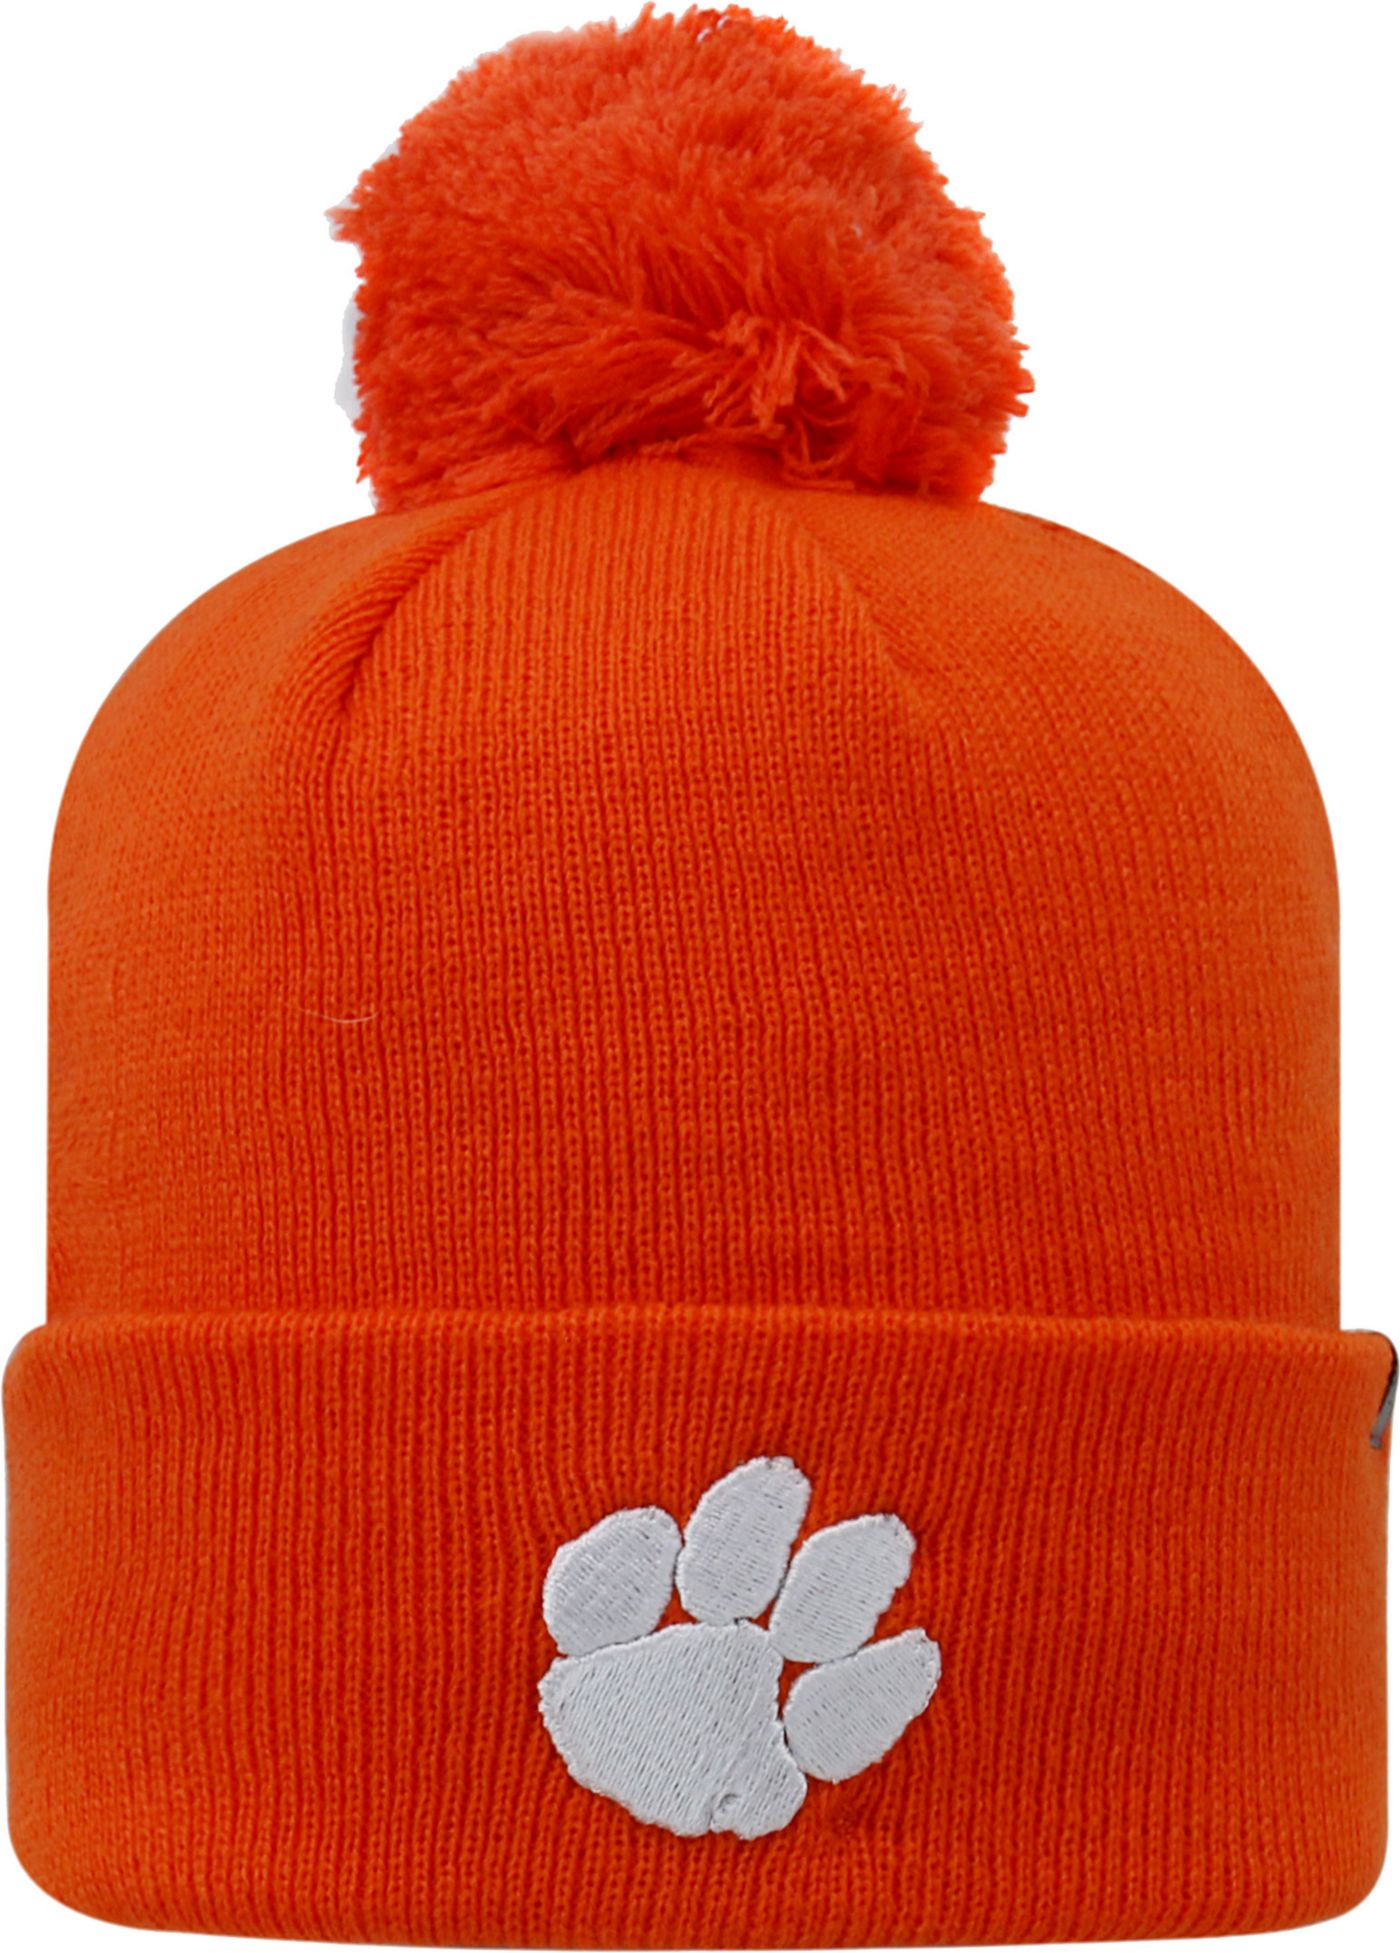 Top of the World Men's Clemson Tigers Orange Pom Knit Beanie